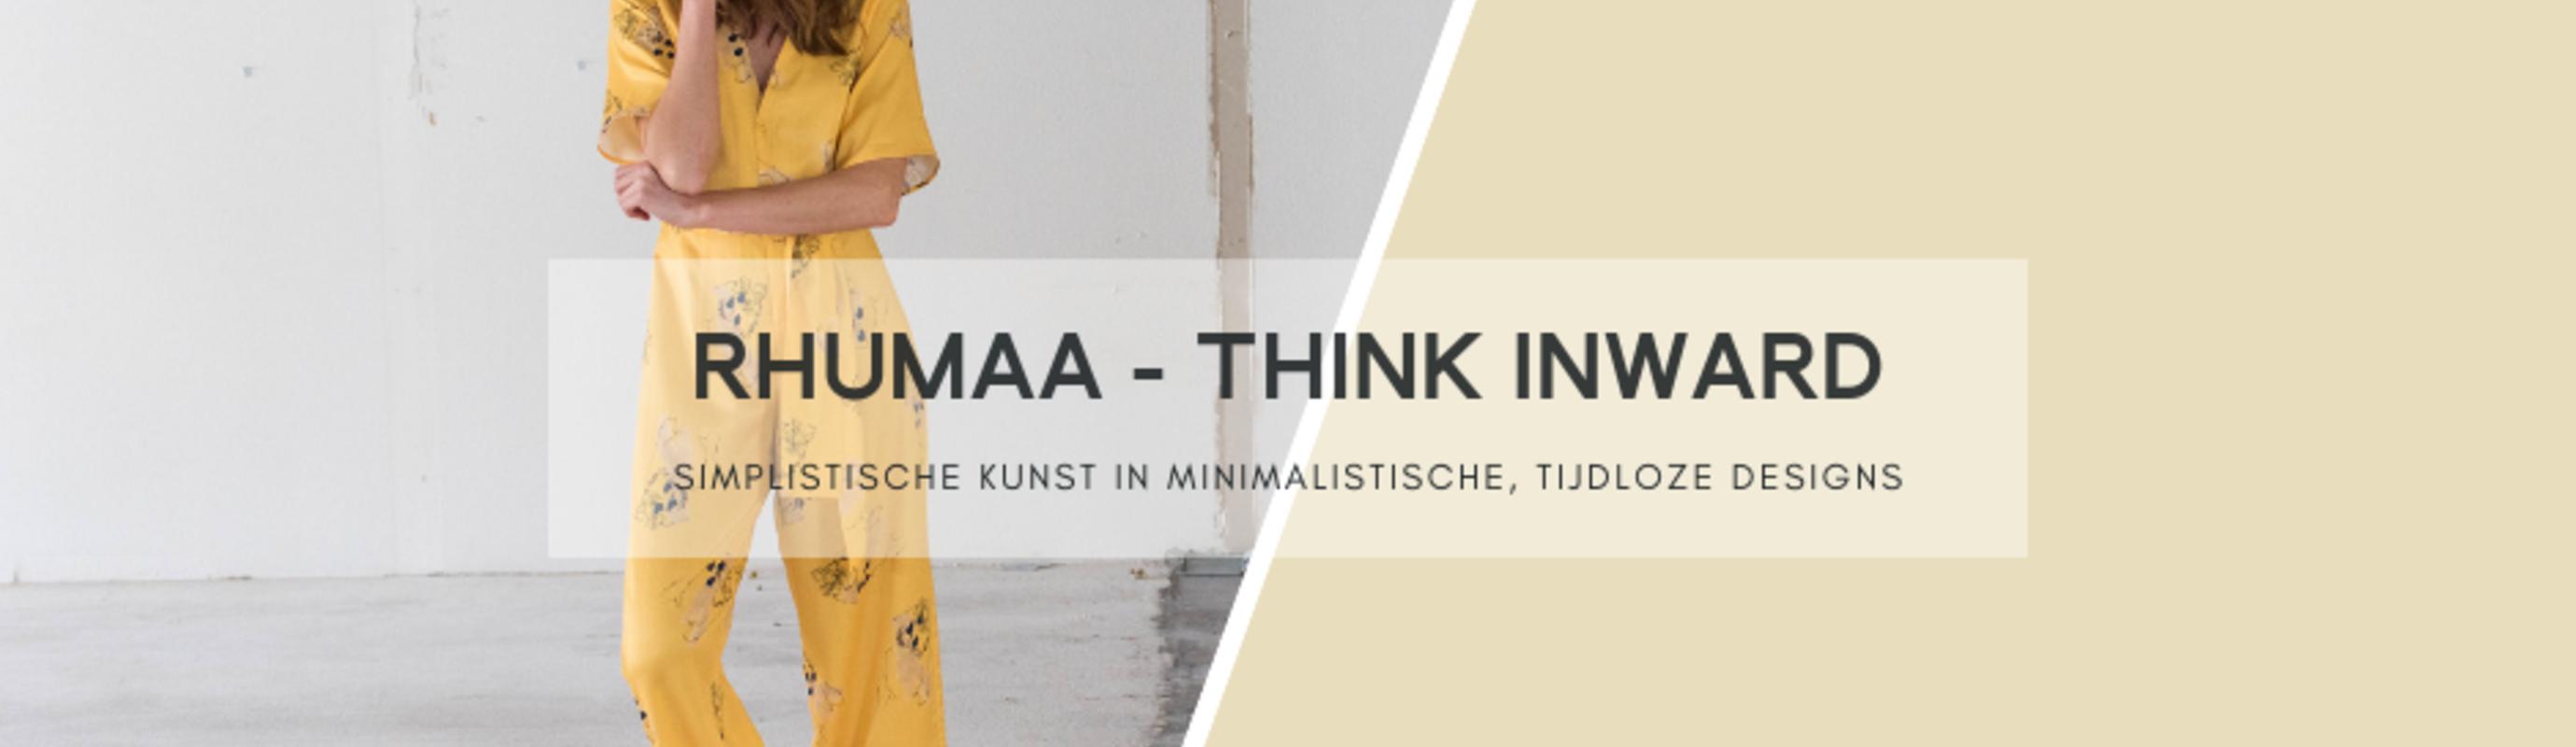 Rhumaa - De Nieuwe Zomercollectie 'Think Inward'